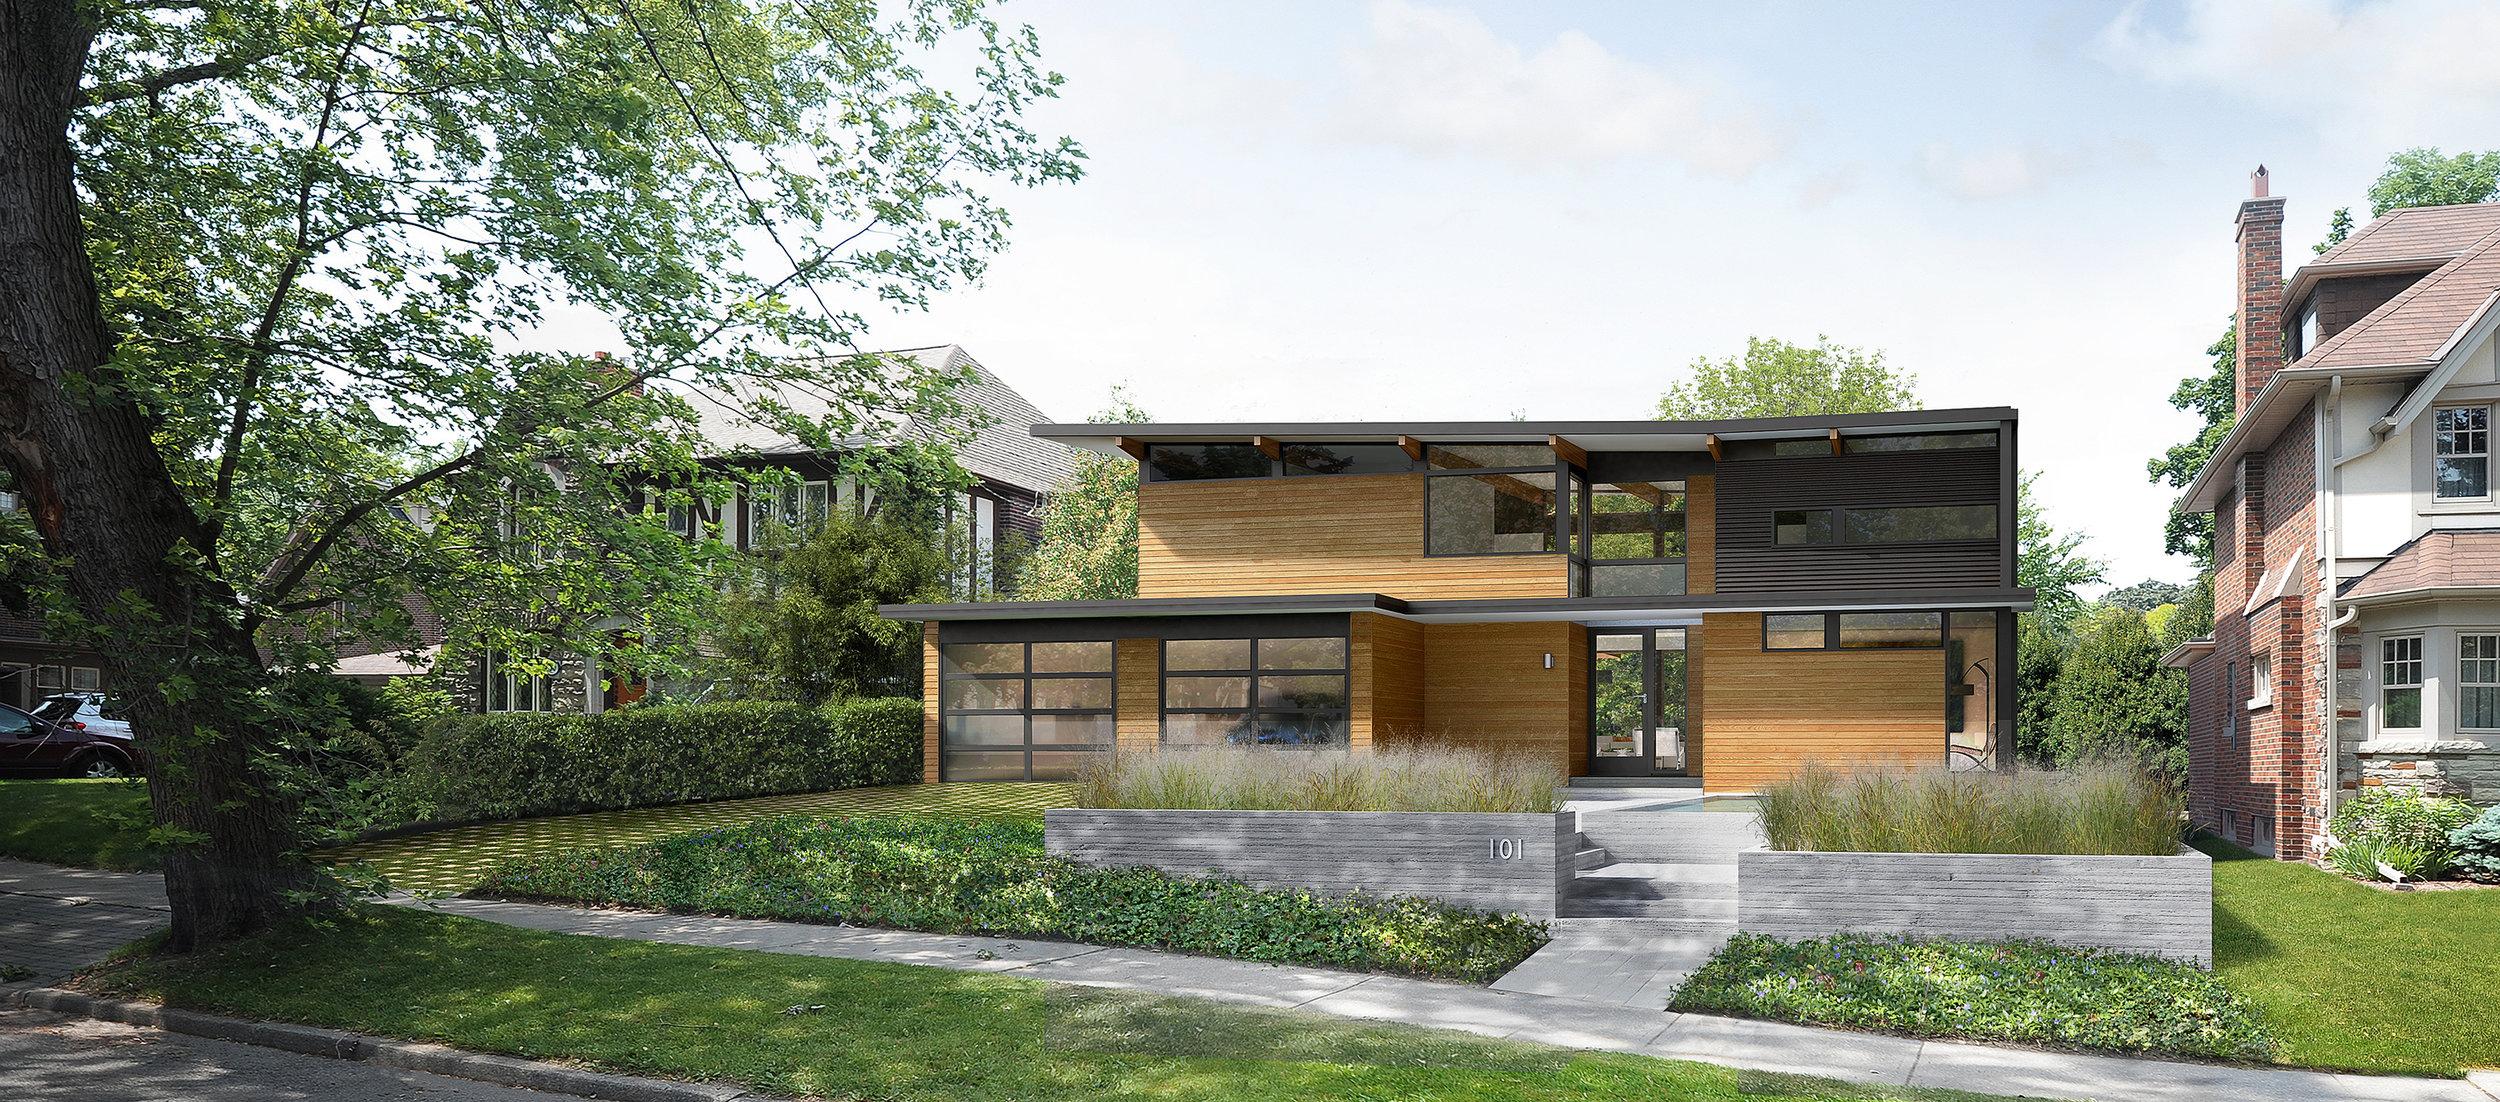 turkel_design_modern_prefab_home_axiom_series_rendering_axiom2390_exterior.jpg